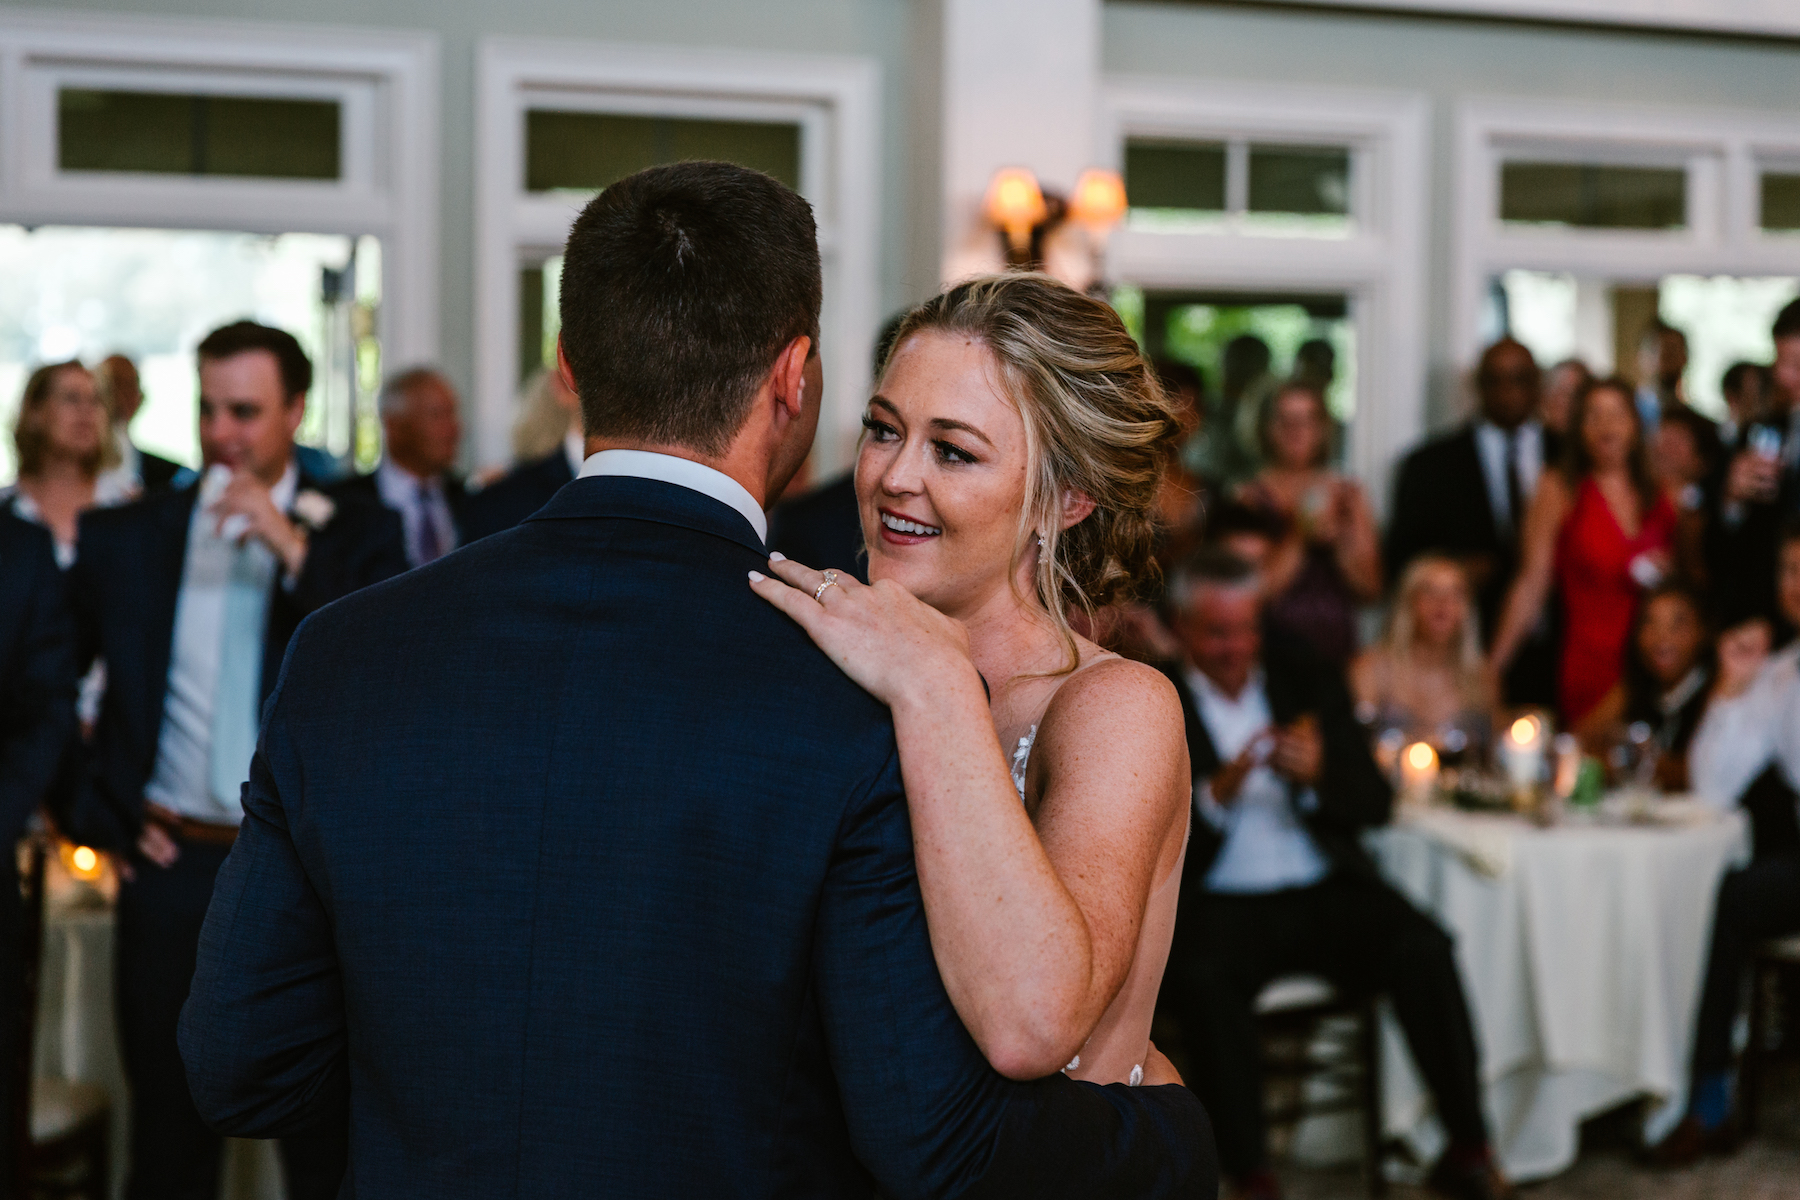 wedding-engagement-photographer-spartanburg-greenville-columbia-carolina-south-north-513.JPG